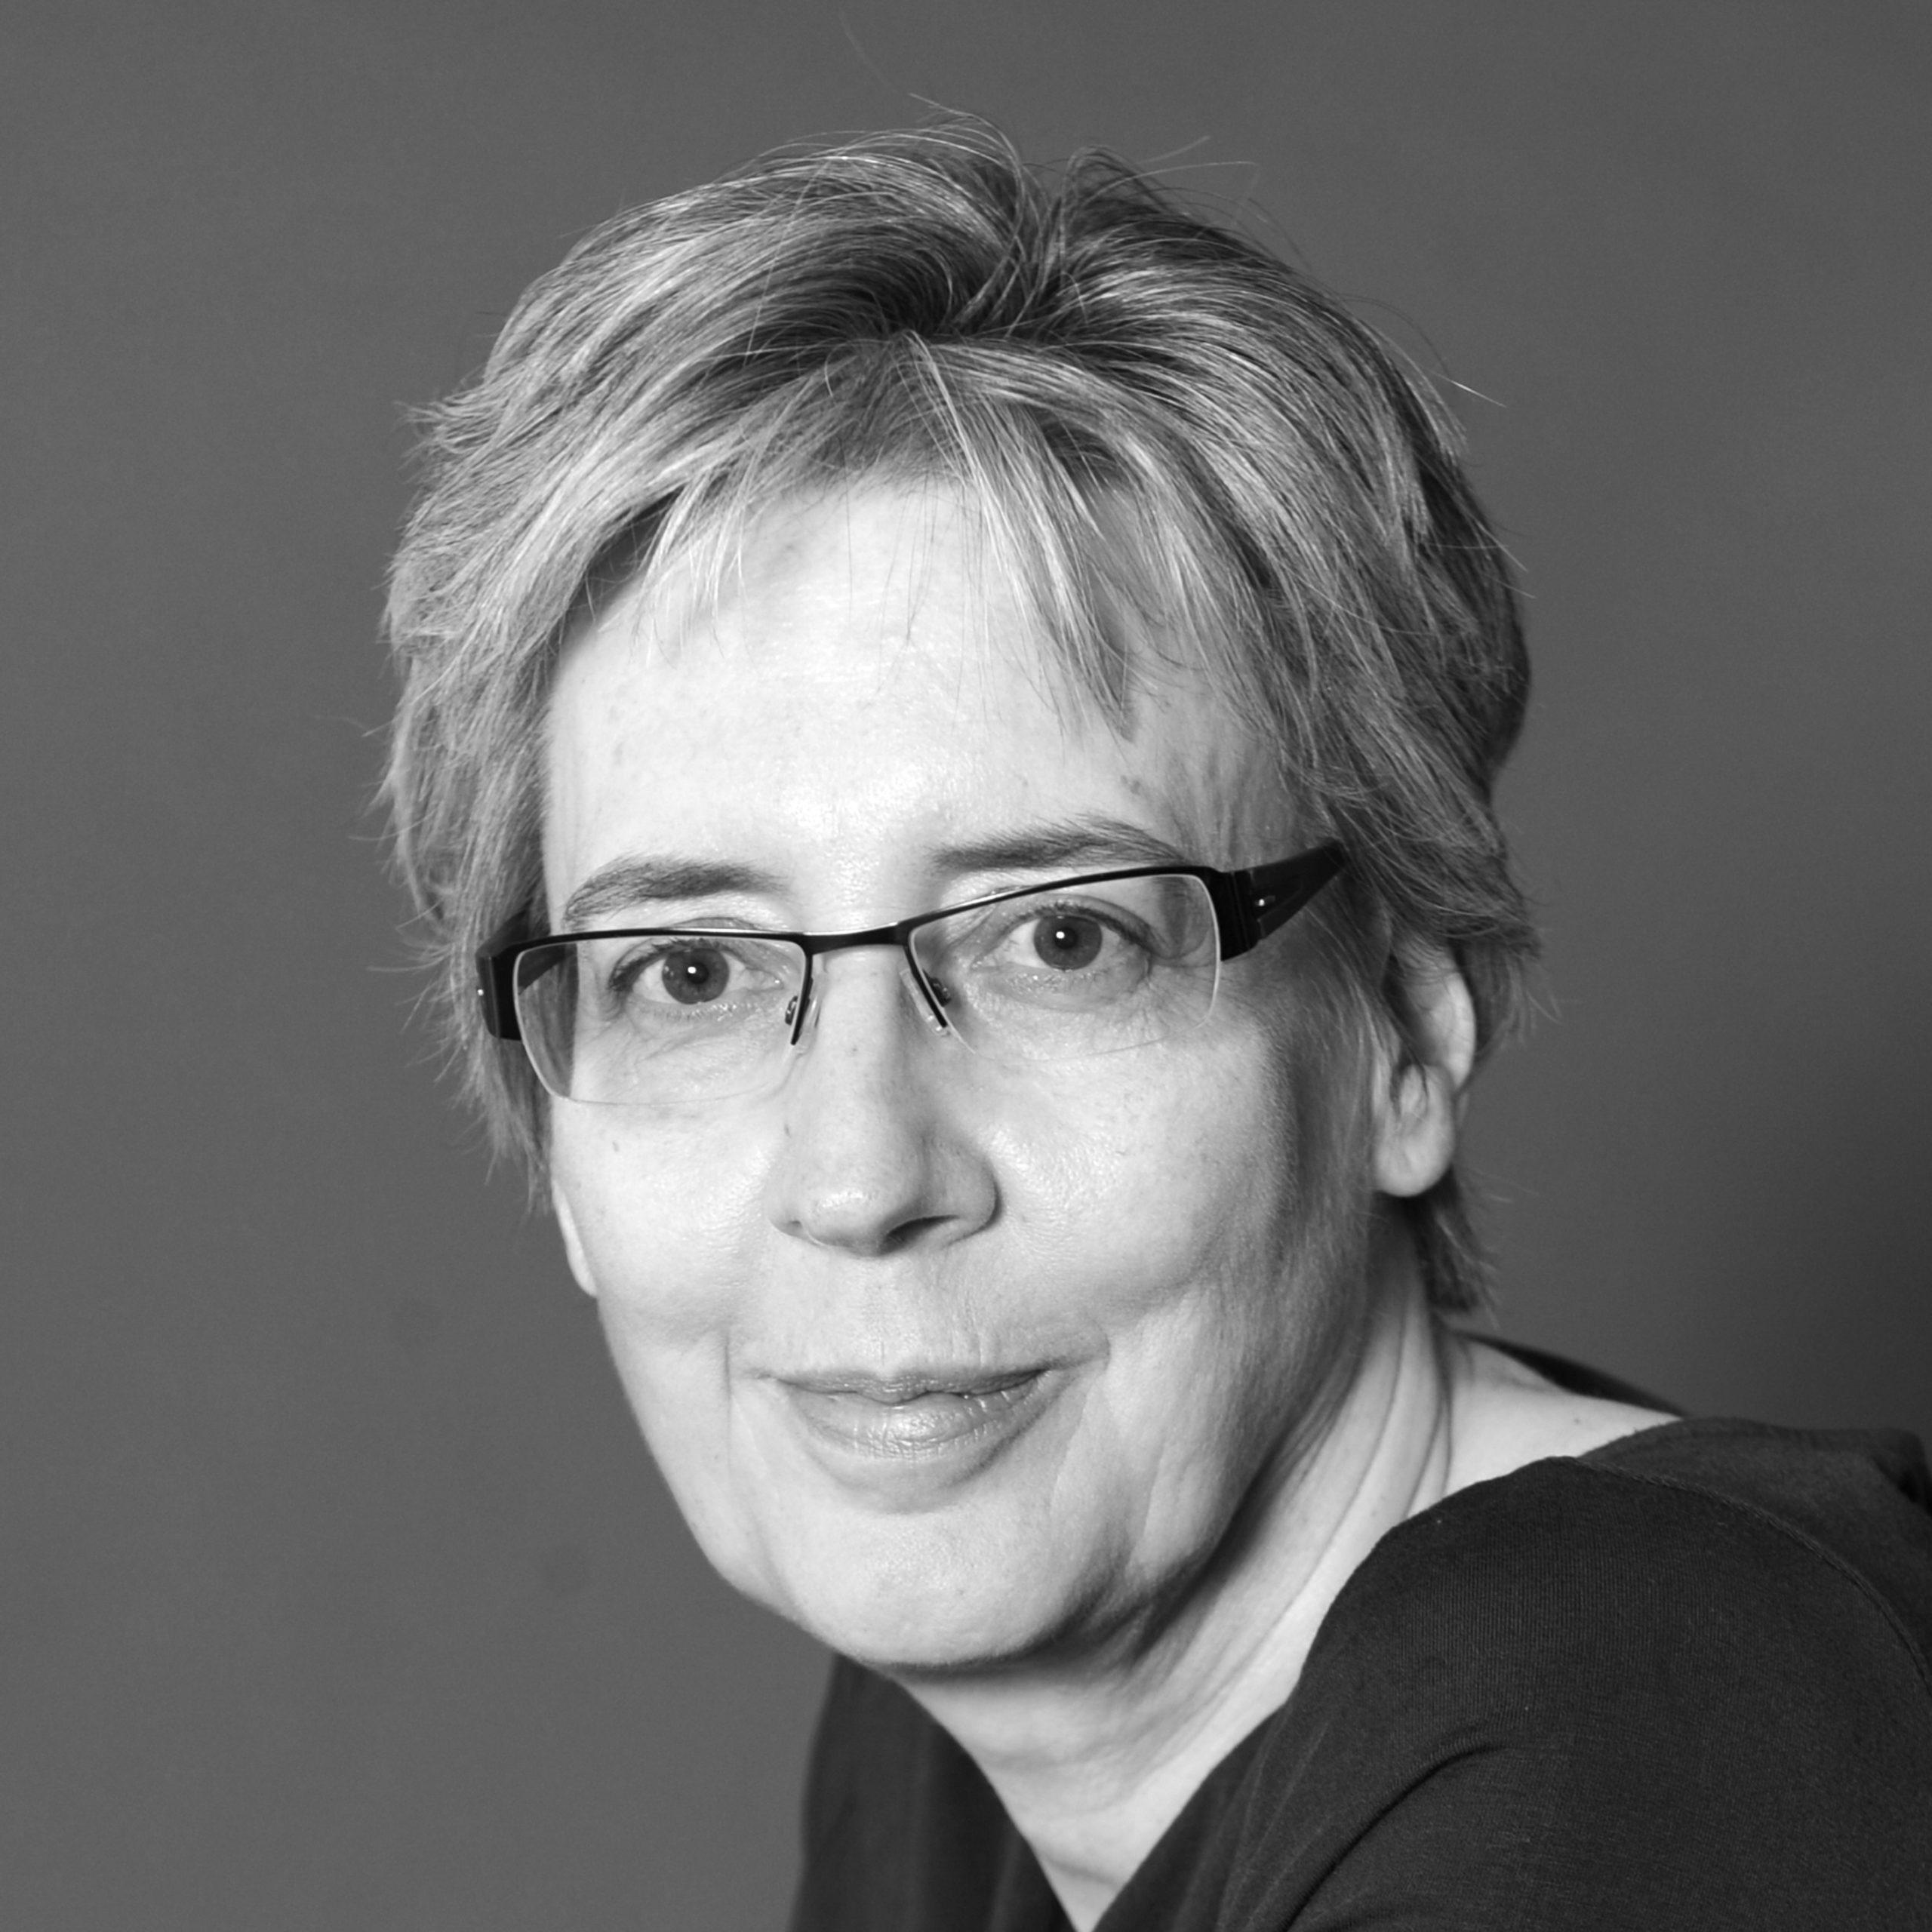 Melanie Scheiwiller Joos